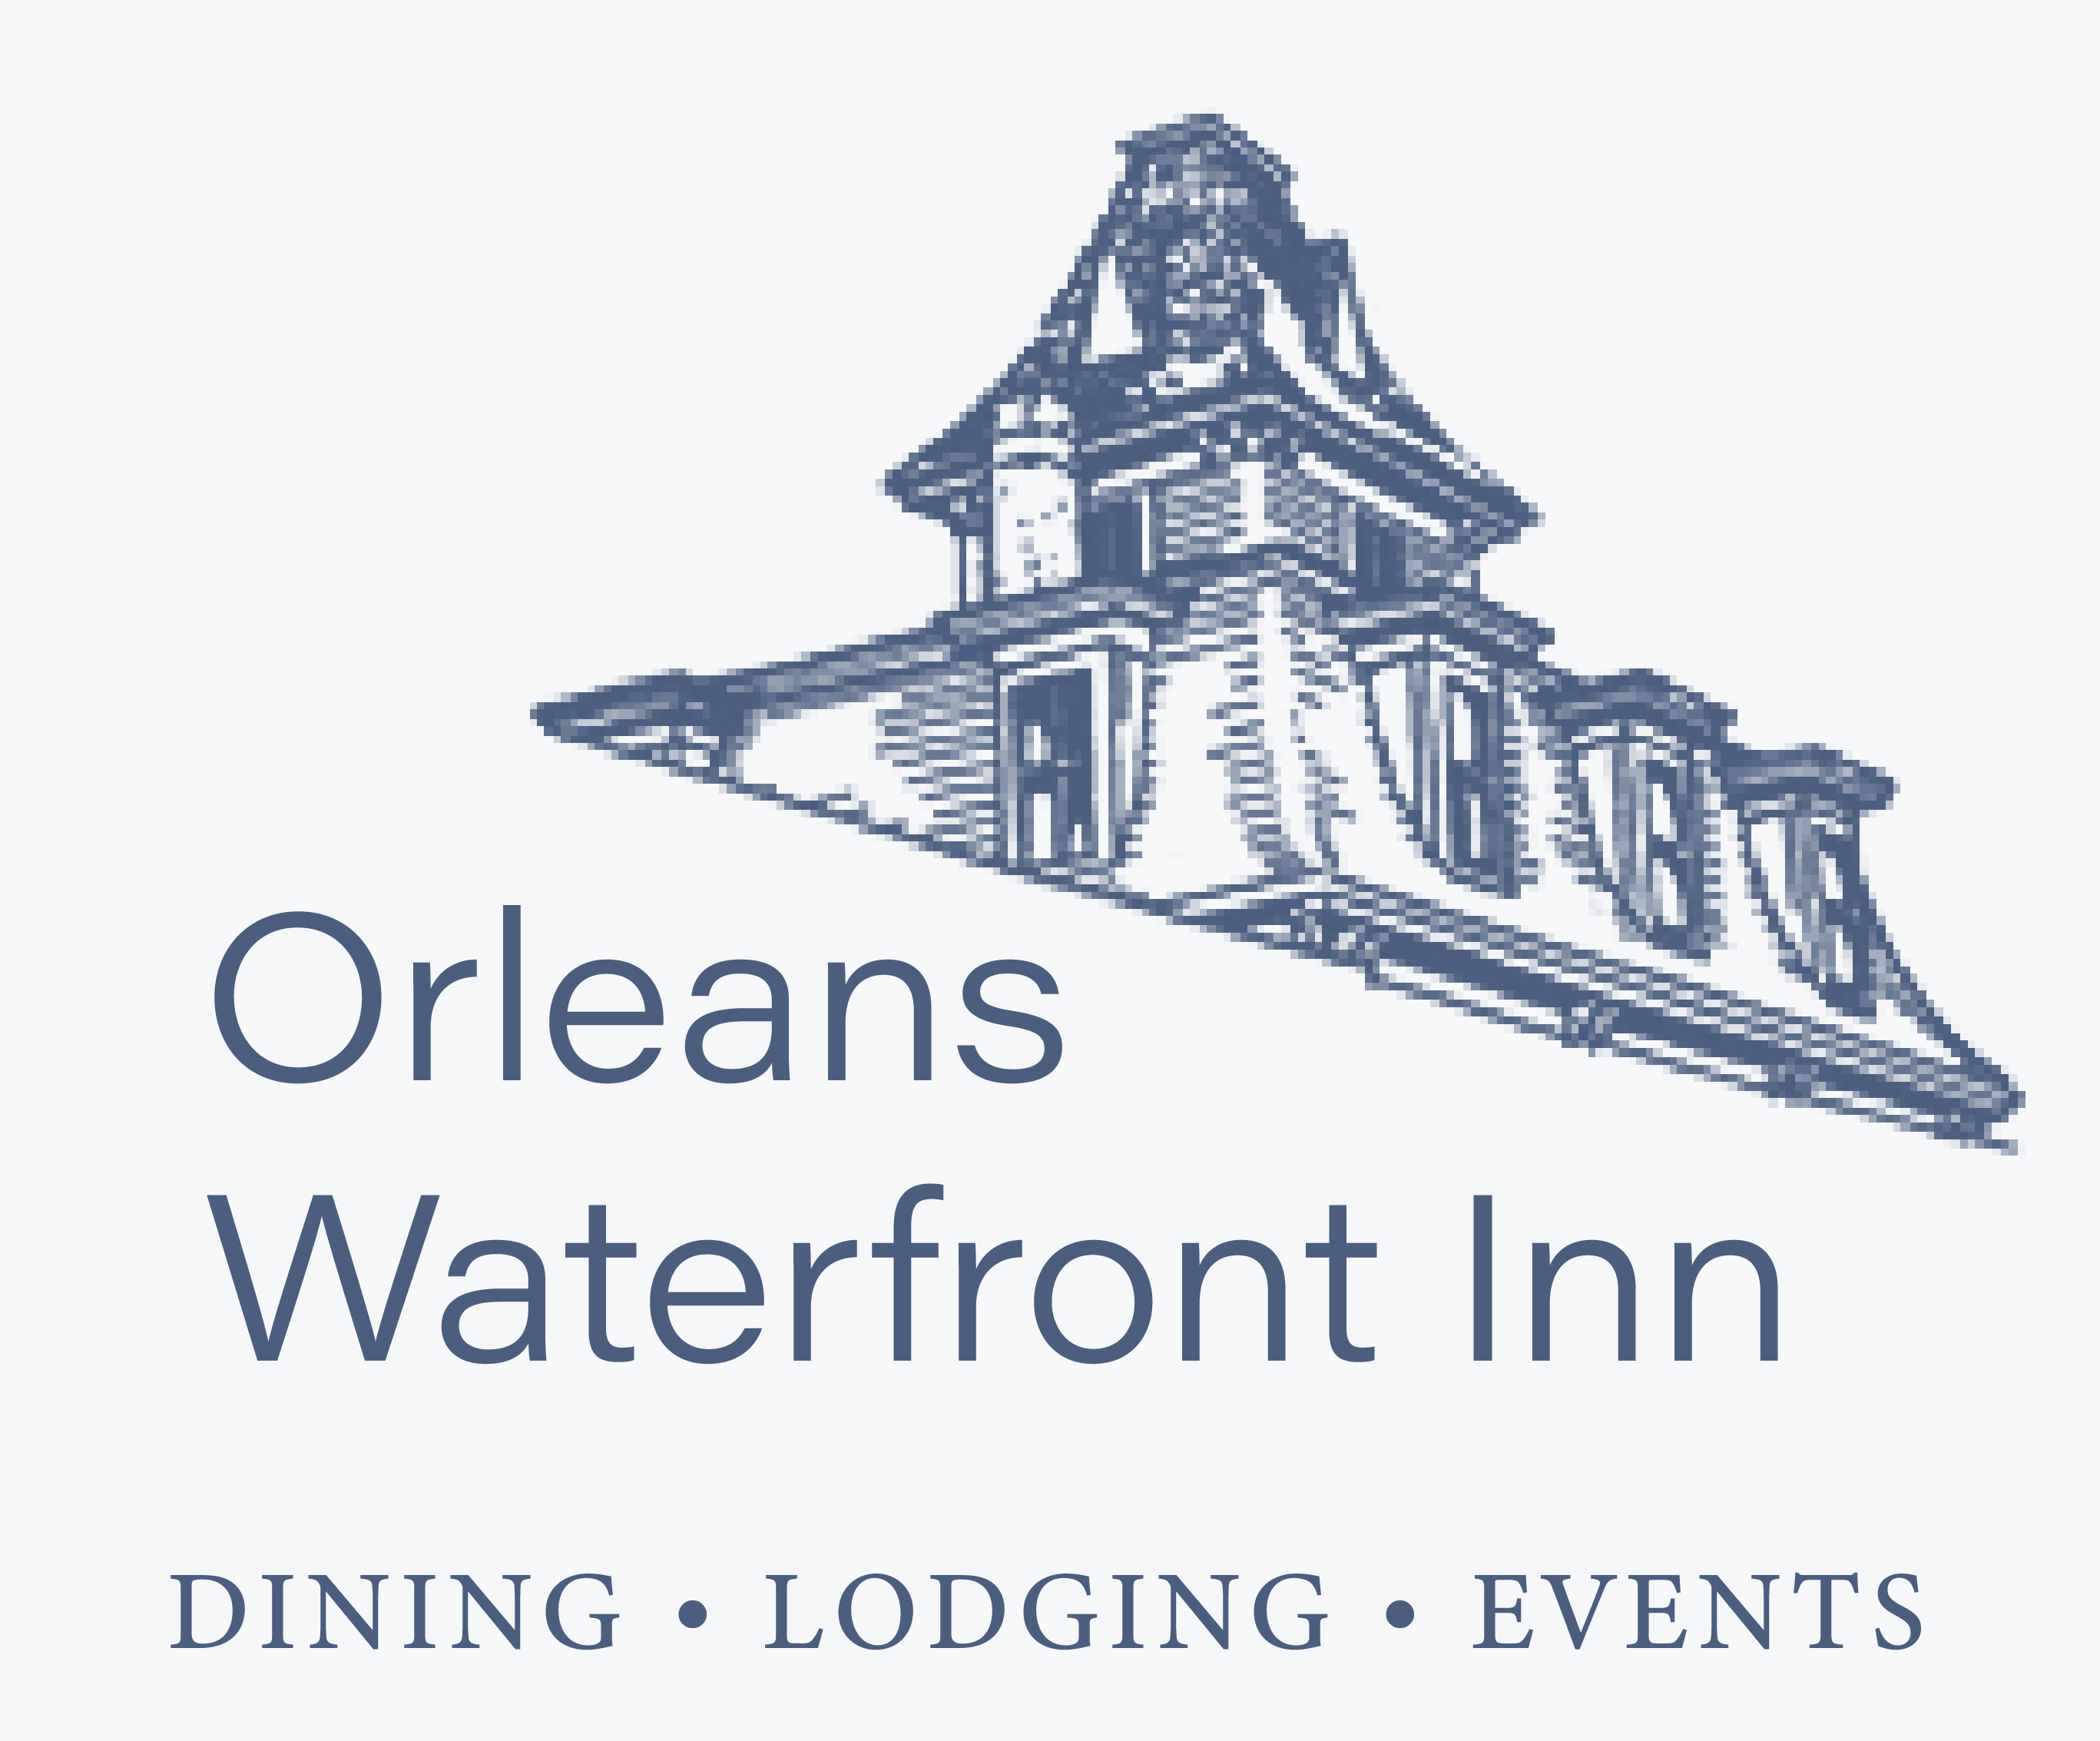 Orleans Waterfront Restaurant Menu | Orleans Waterfront Inn, MA